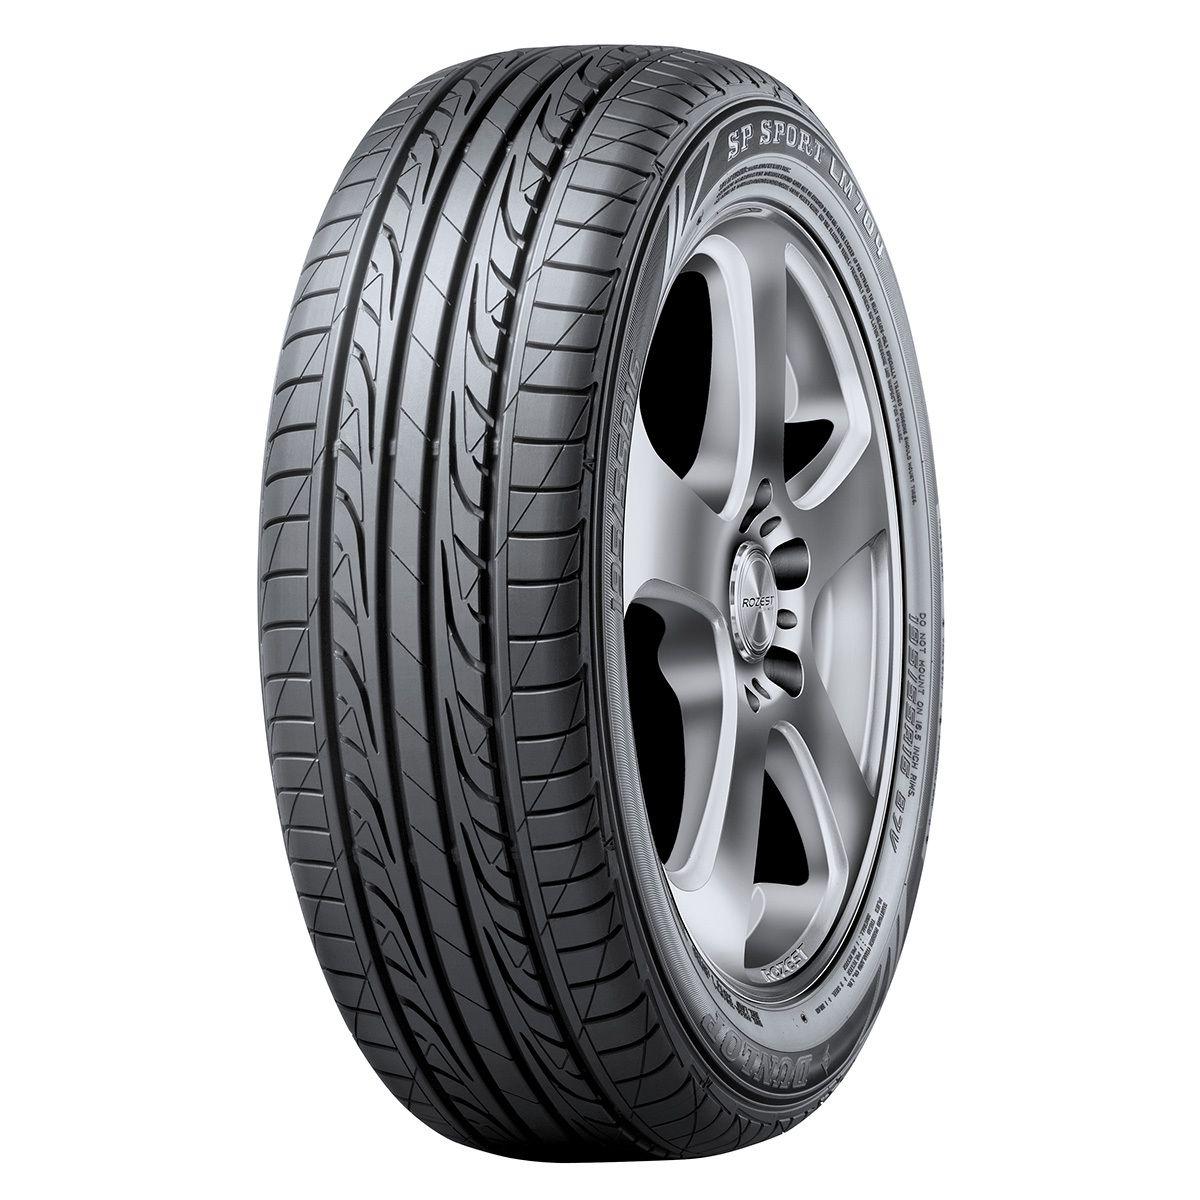 Pneu Dunlop 215/45Z R17 91W SP LM704 XL EV